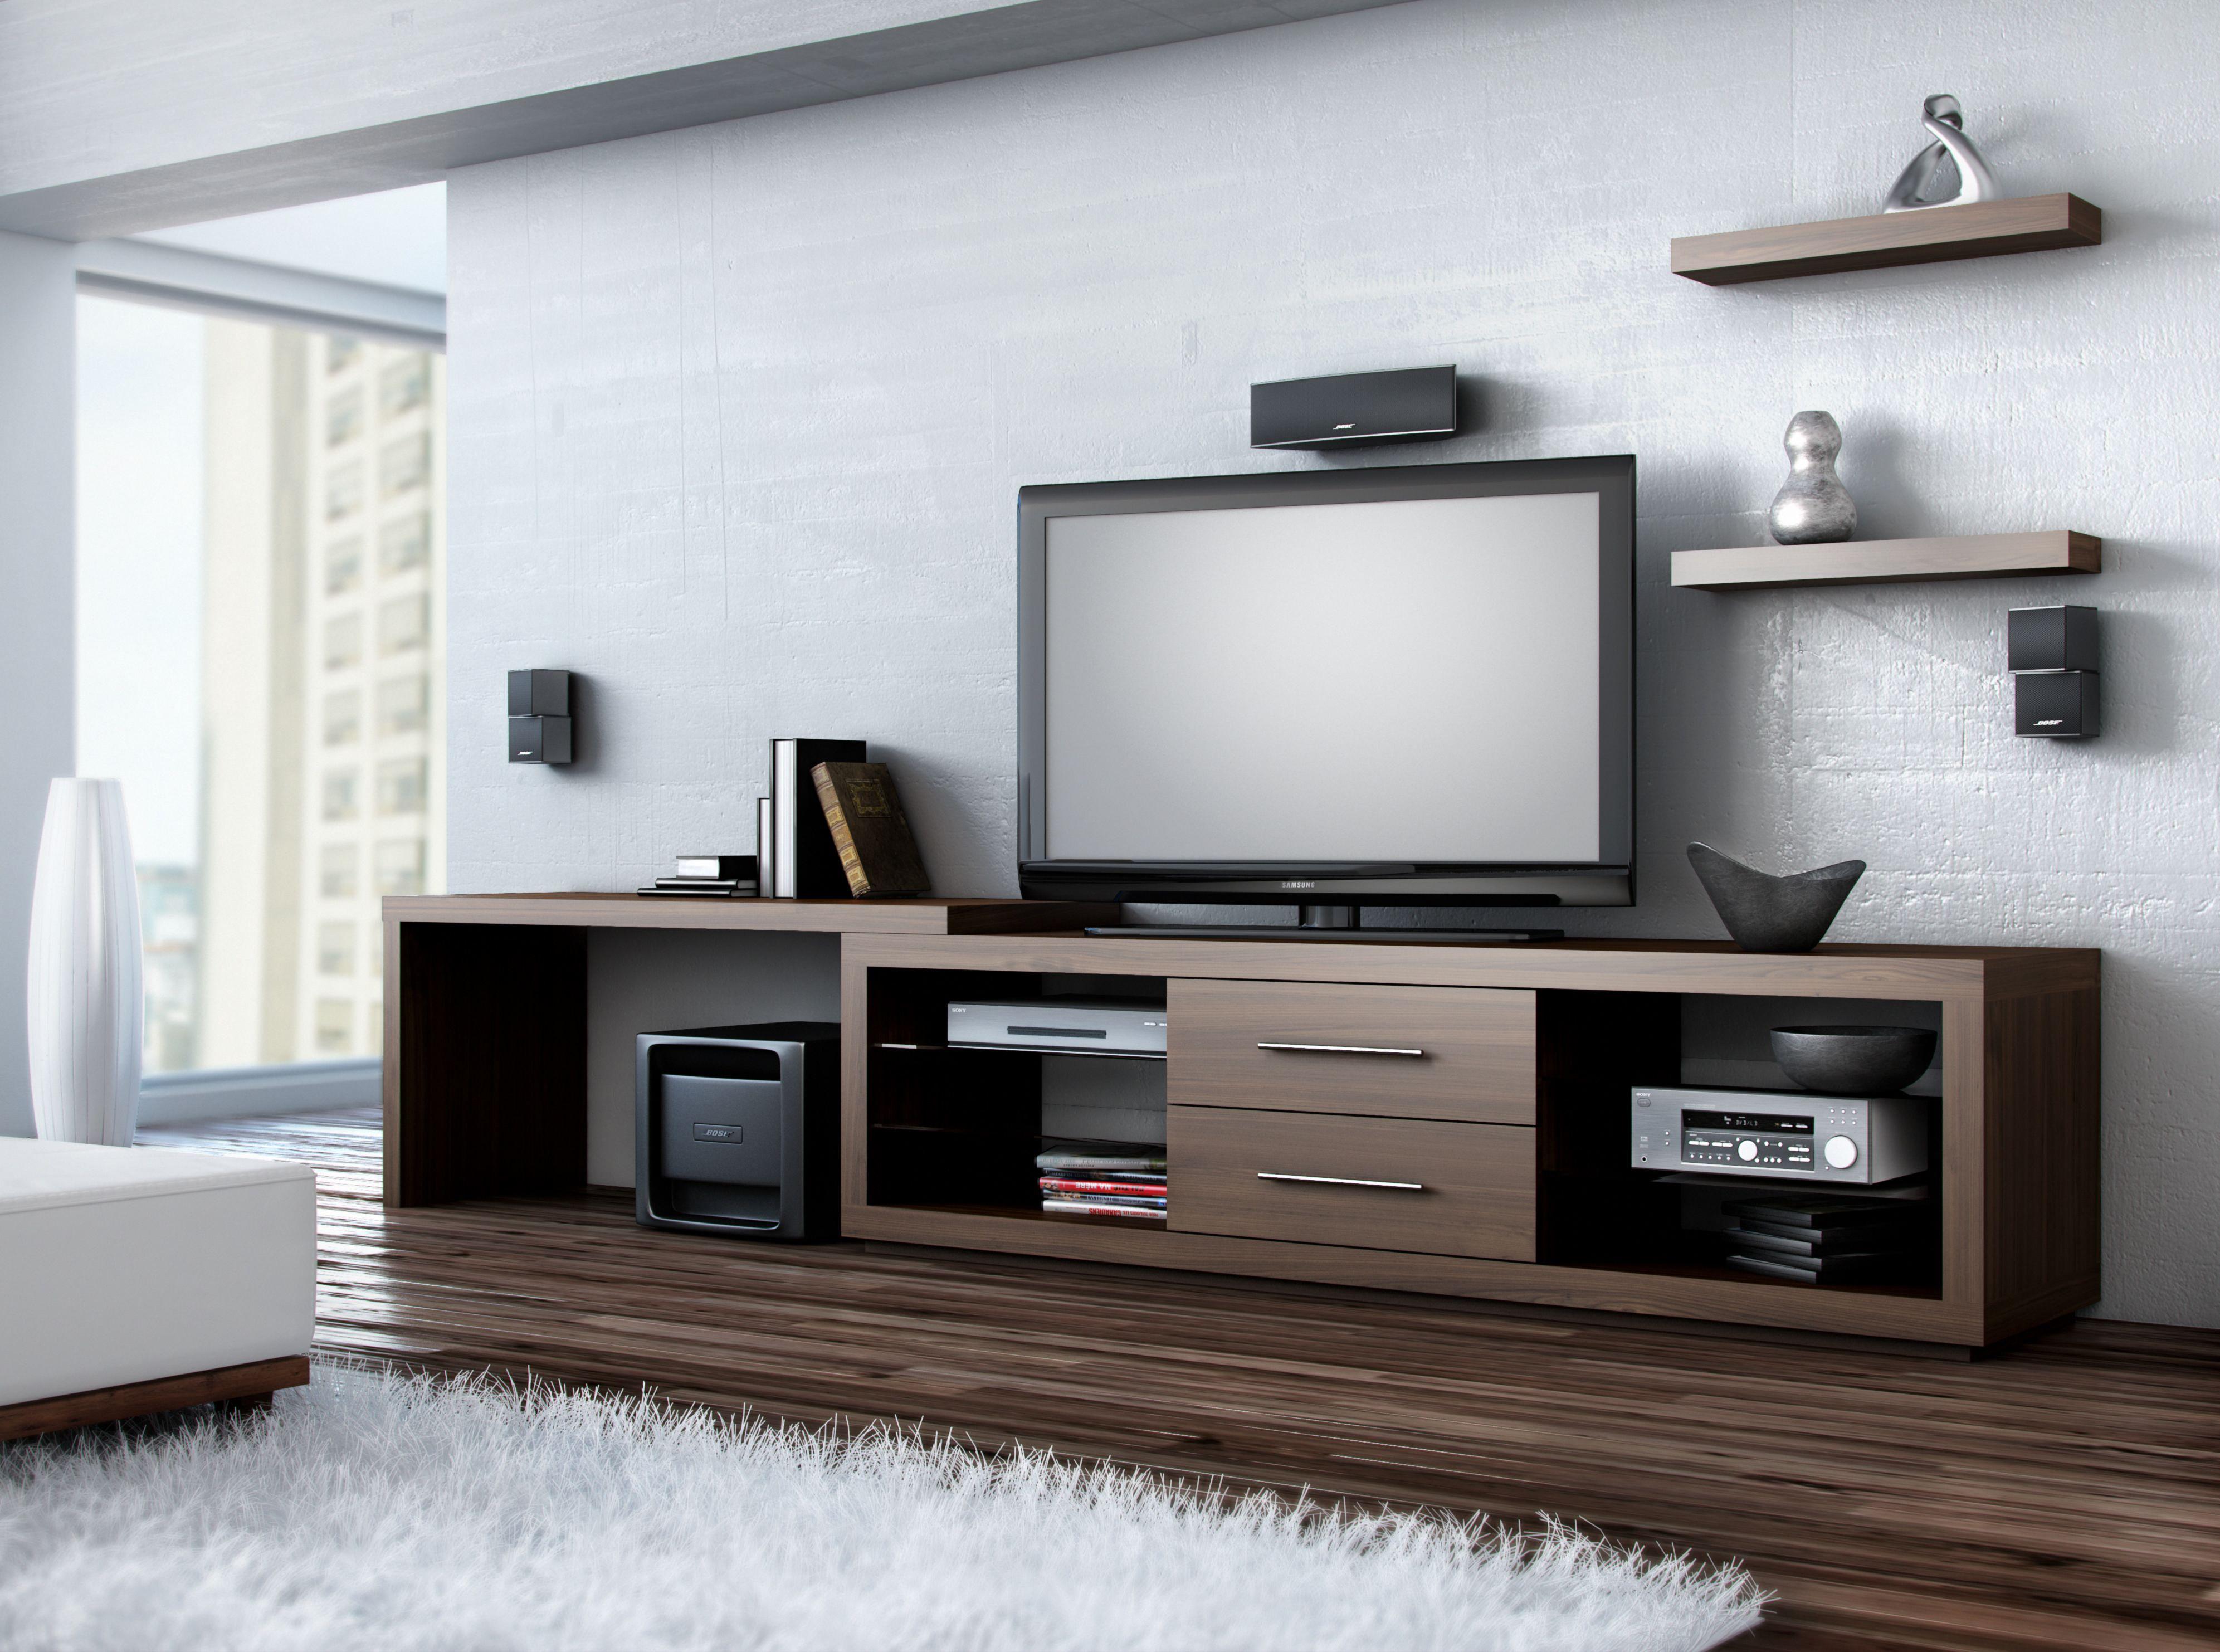 Mediastorage Living Rooms